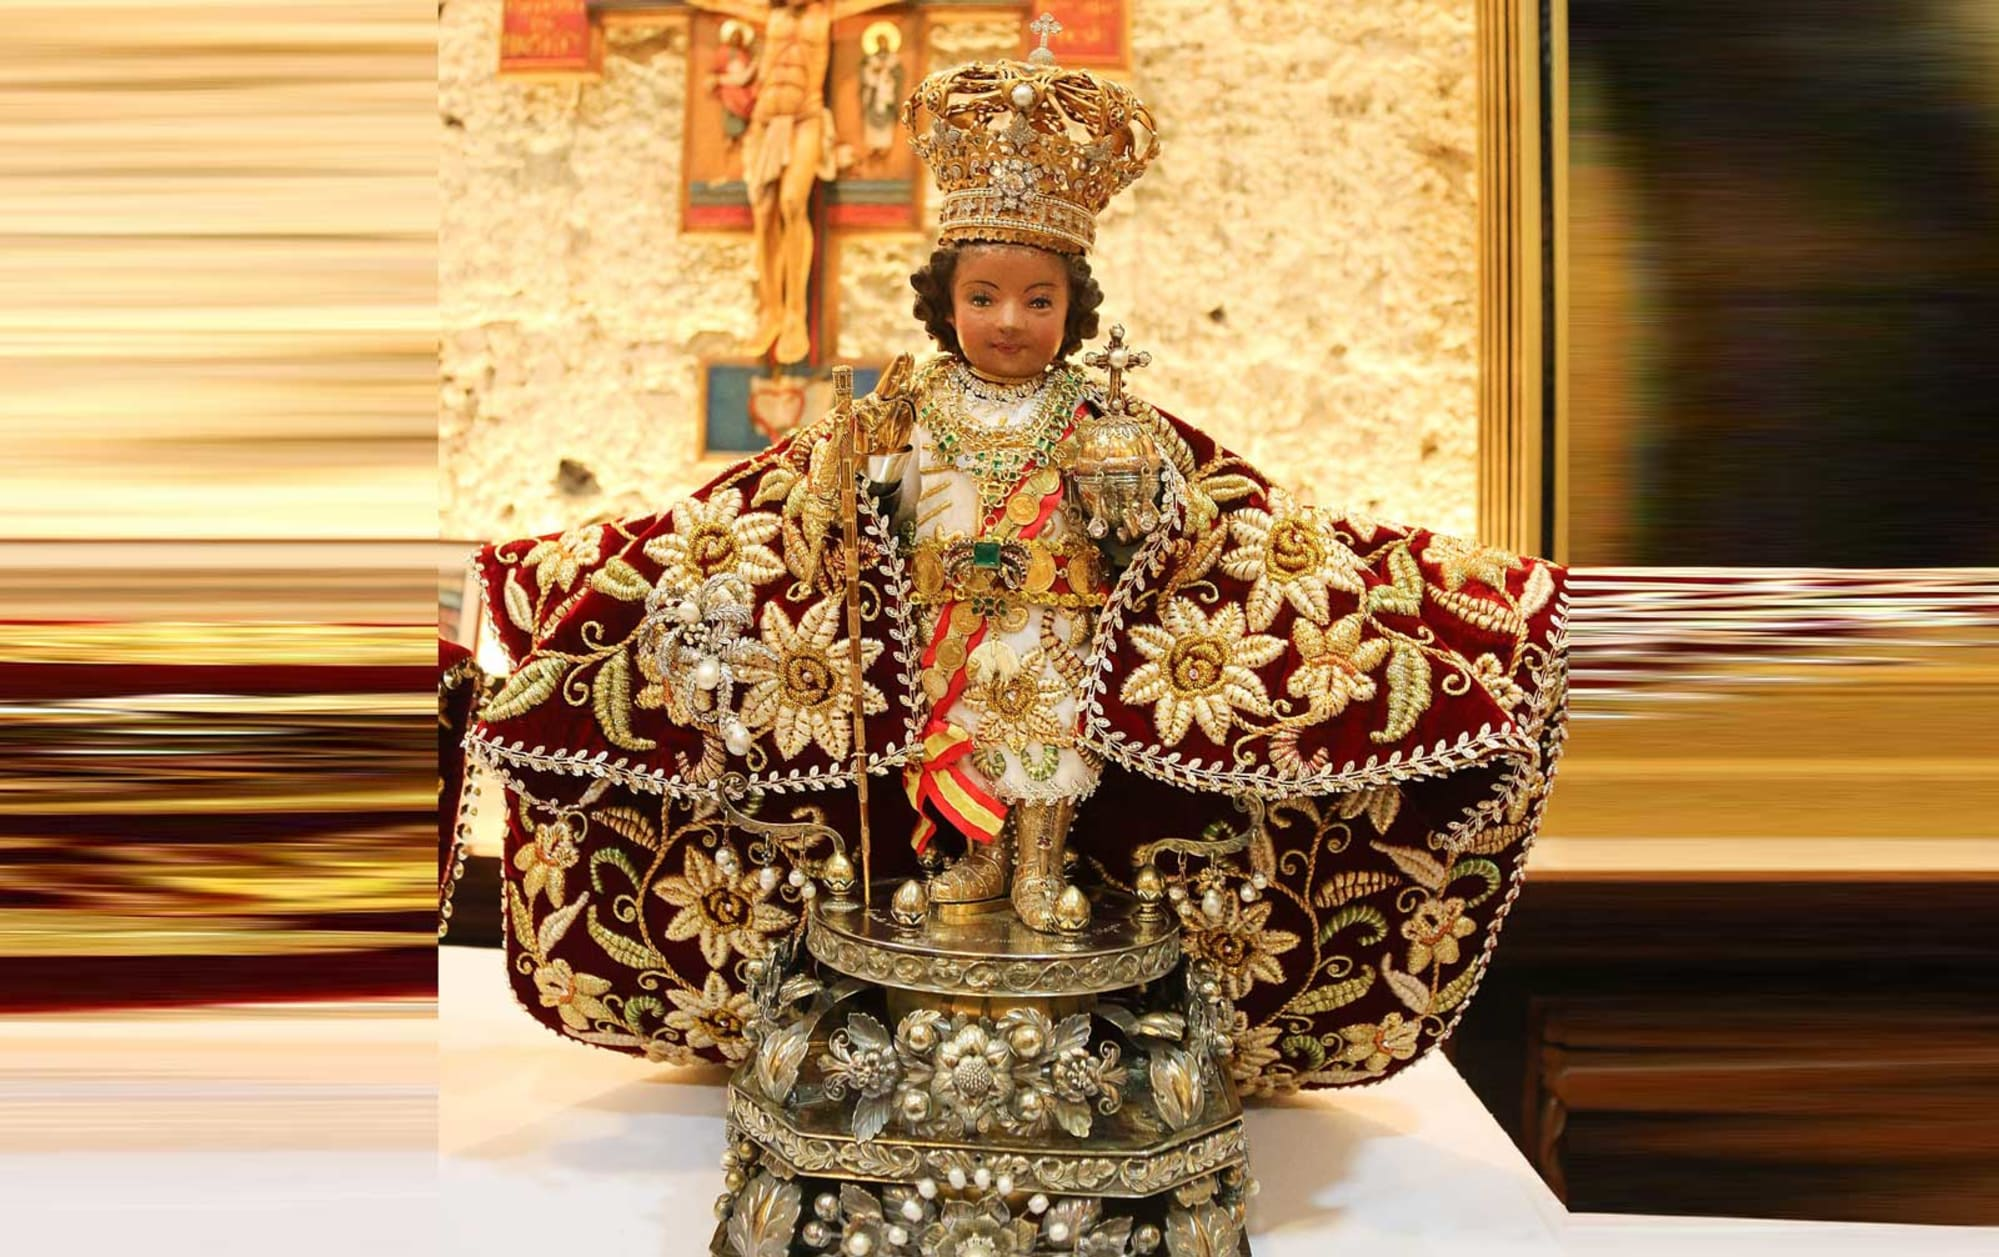 Basilica Minore del Sto. Niño de Cebu Church and the image of the Santo Niño de Cebu will be declare as National Cultural Treasures